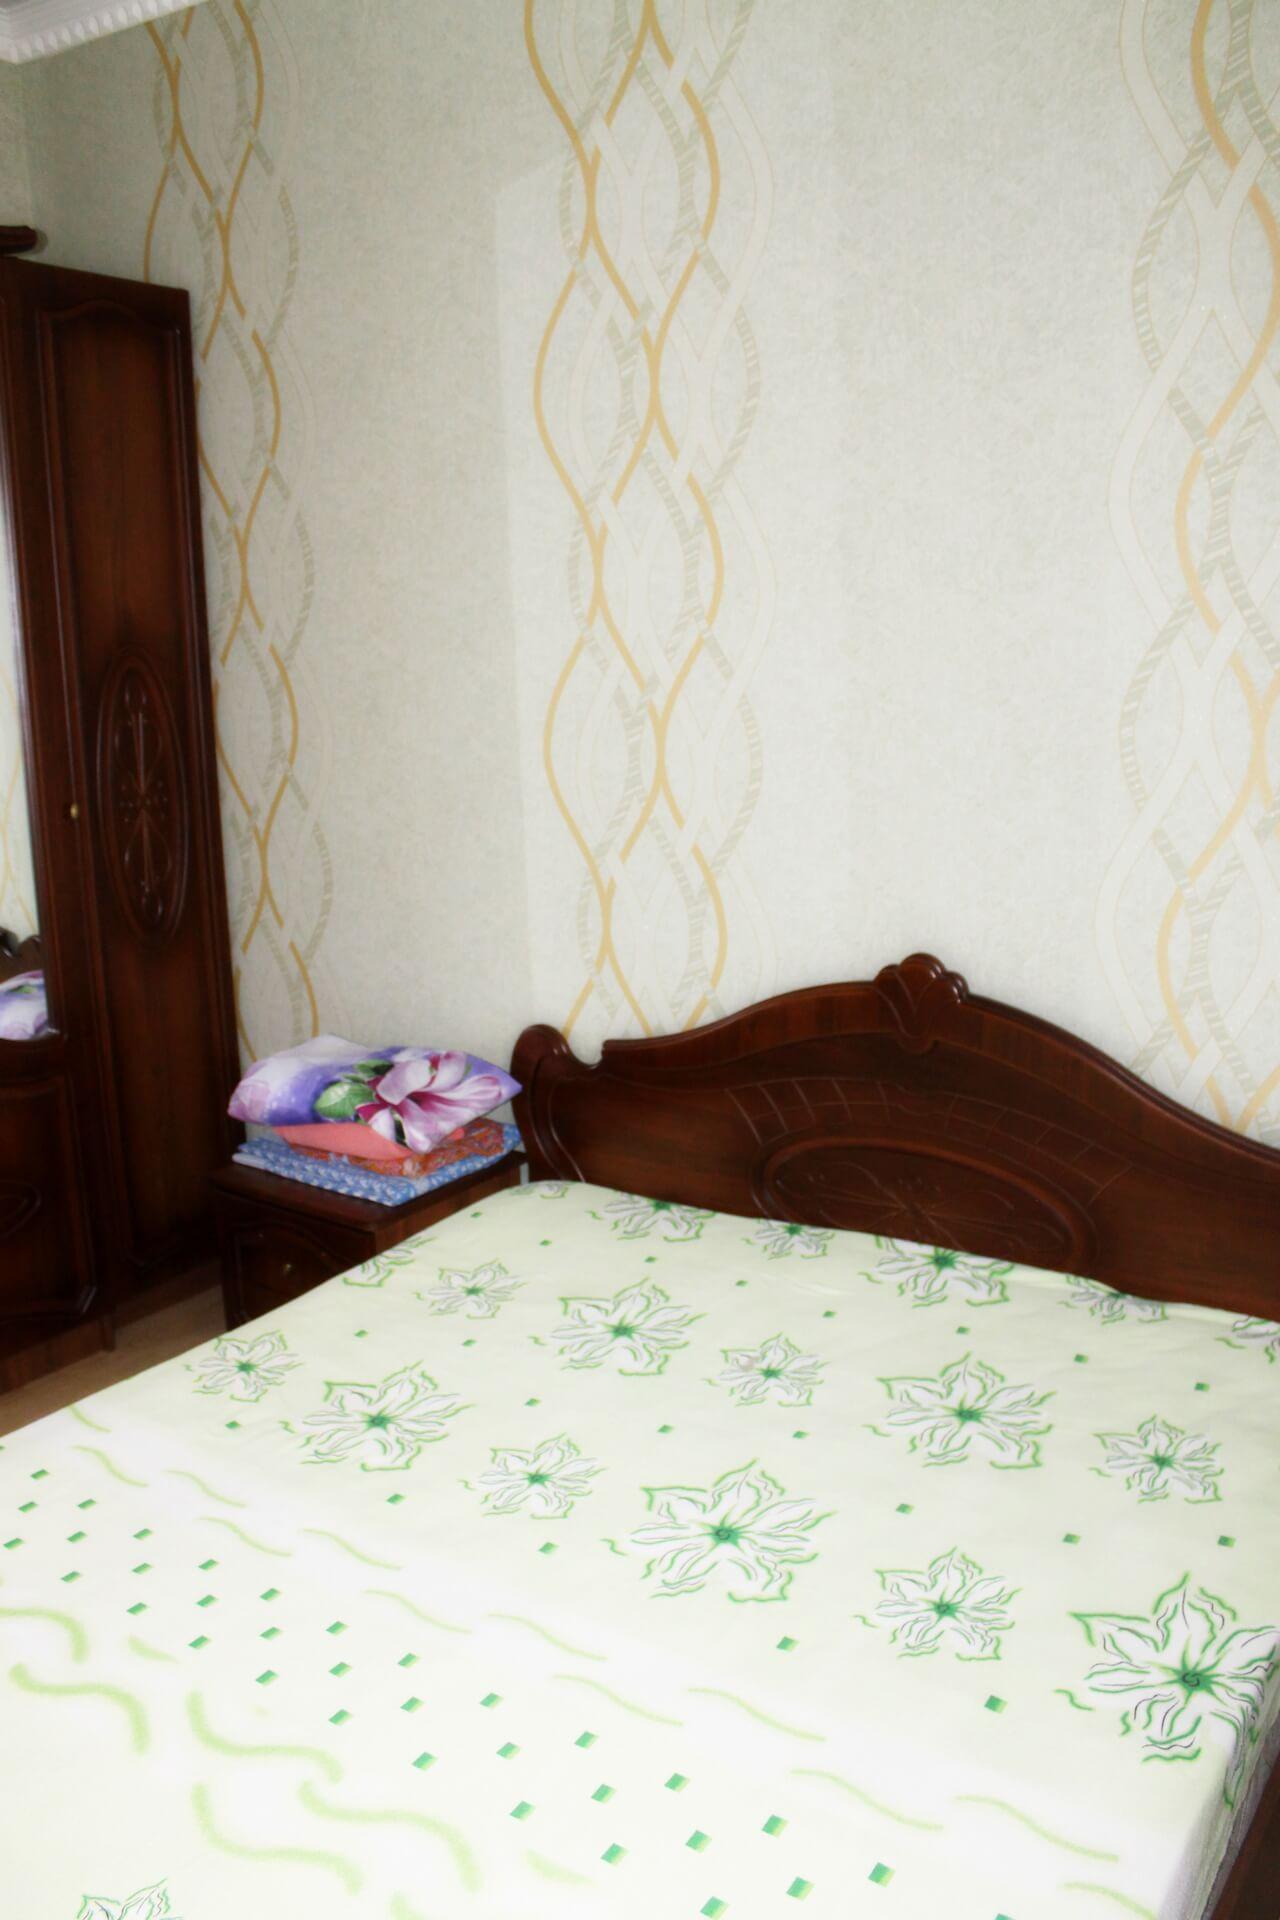 Гостевой дом на улице Веселая - image Gostevoj-dom-v-Adlere-8 on http://bizneskvartal.ru